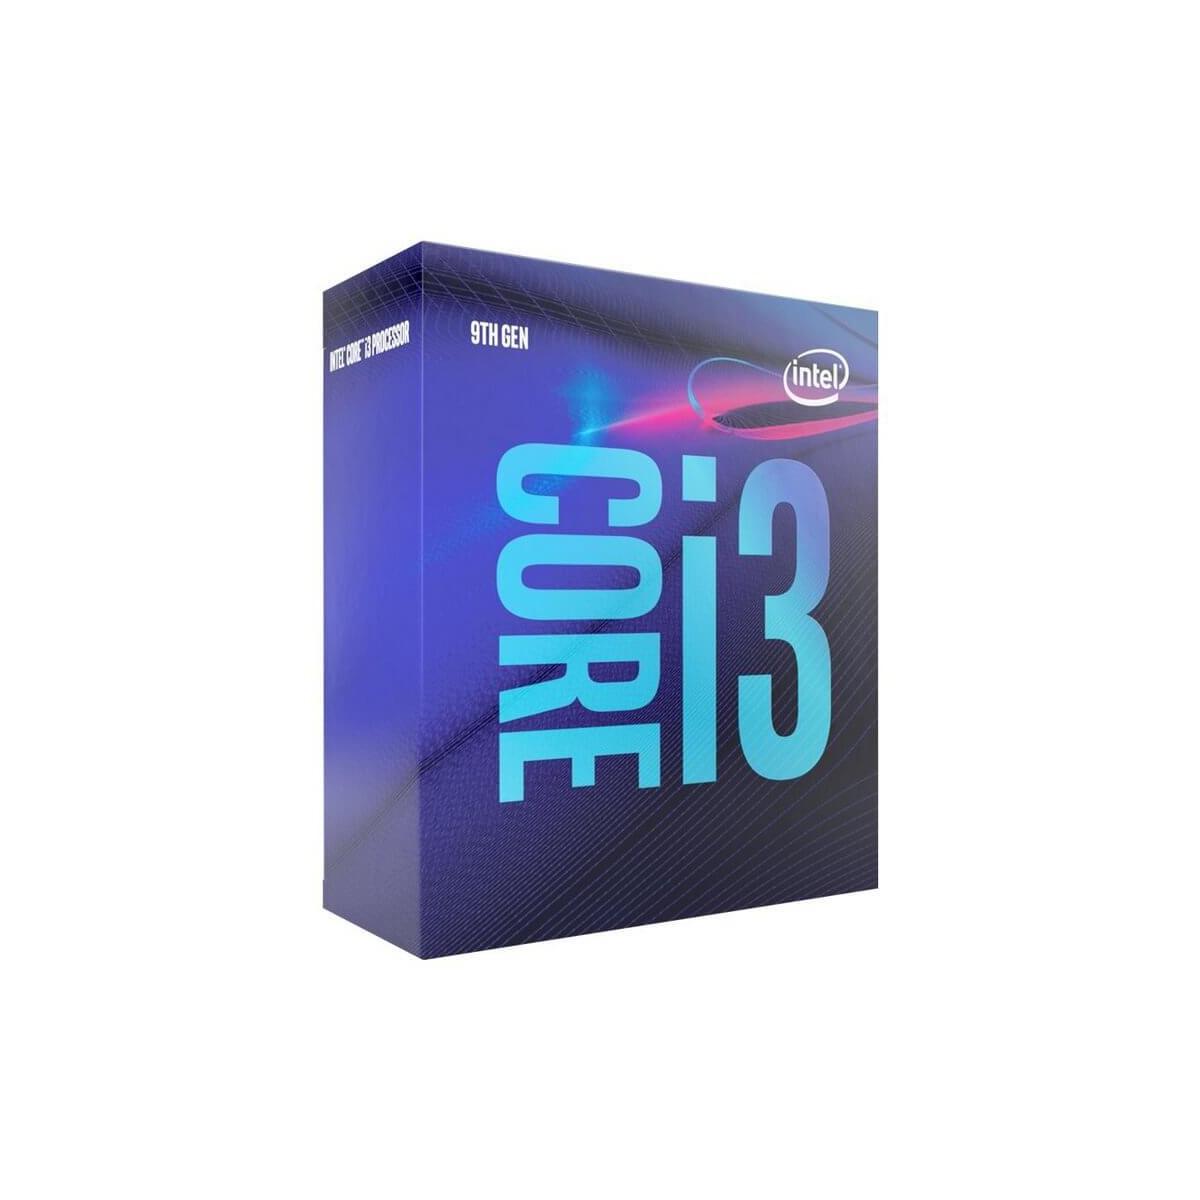 Procesador Intel Core i3-9100 3.6 GHz